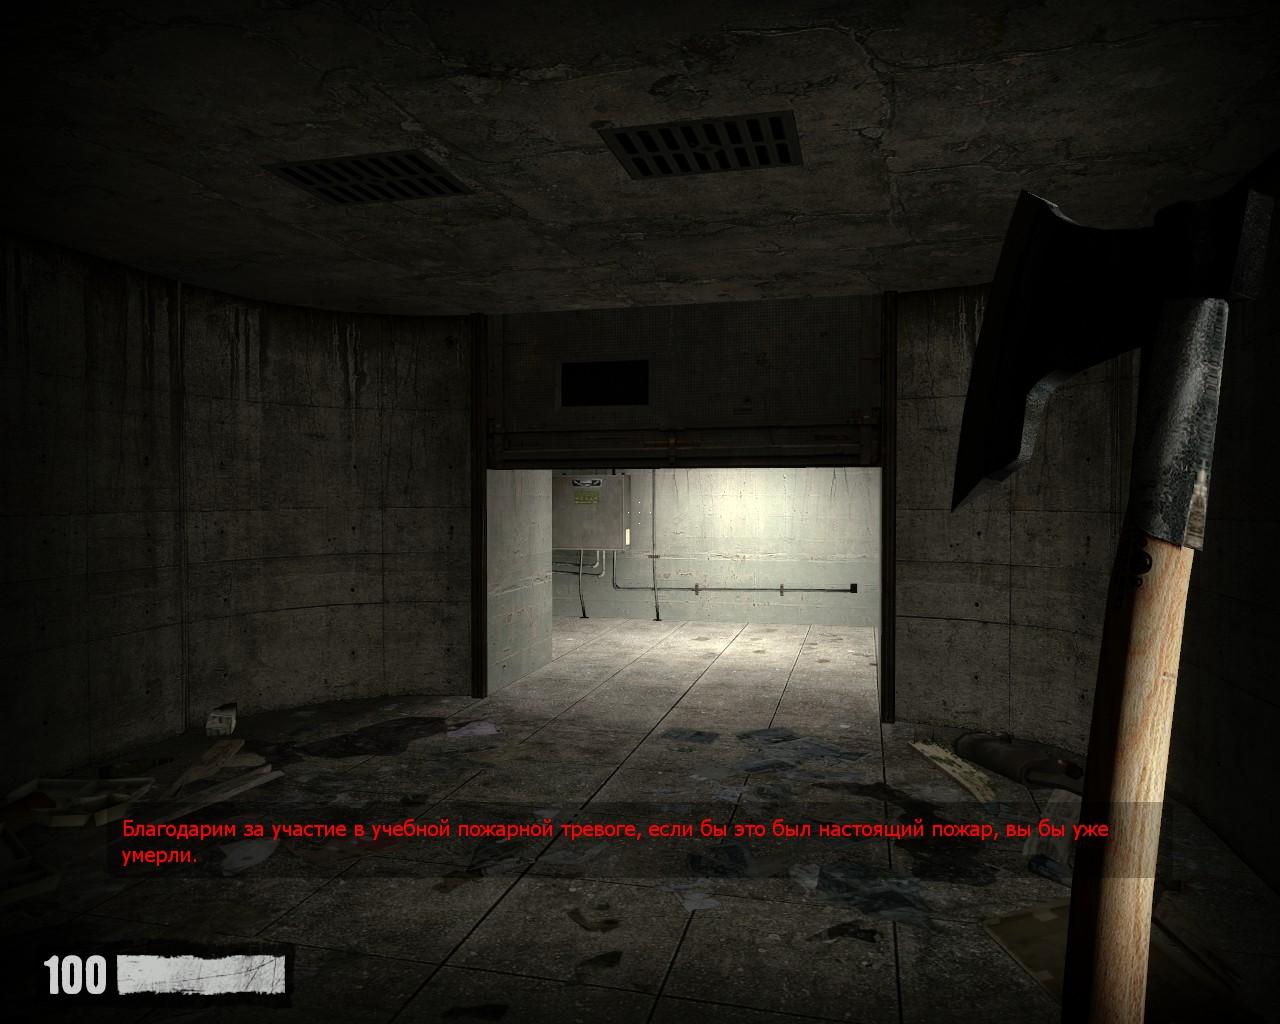 hl2 2015-02-05 23-04-18-18.jpg - Half-Life 2